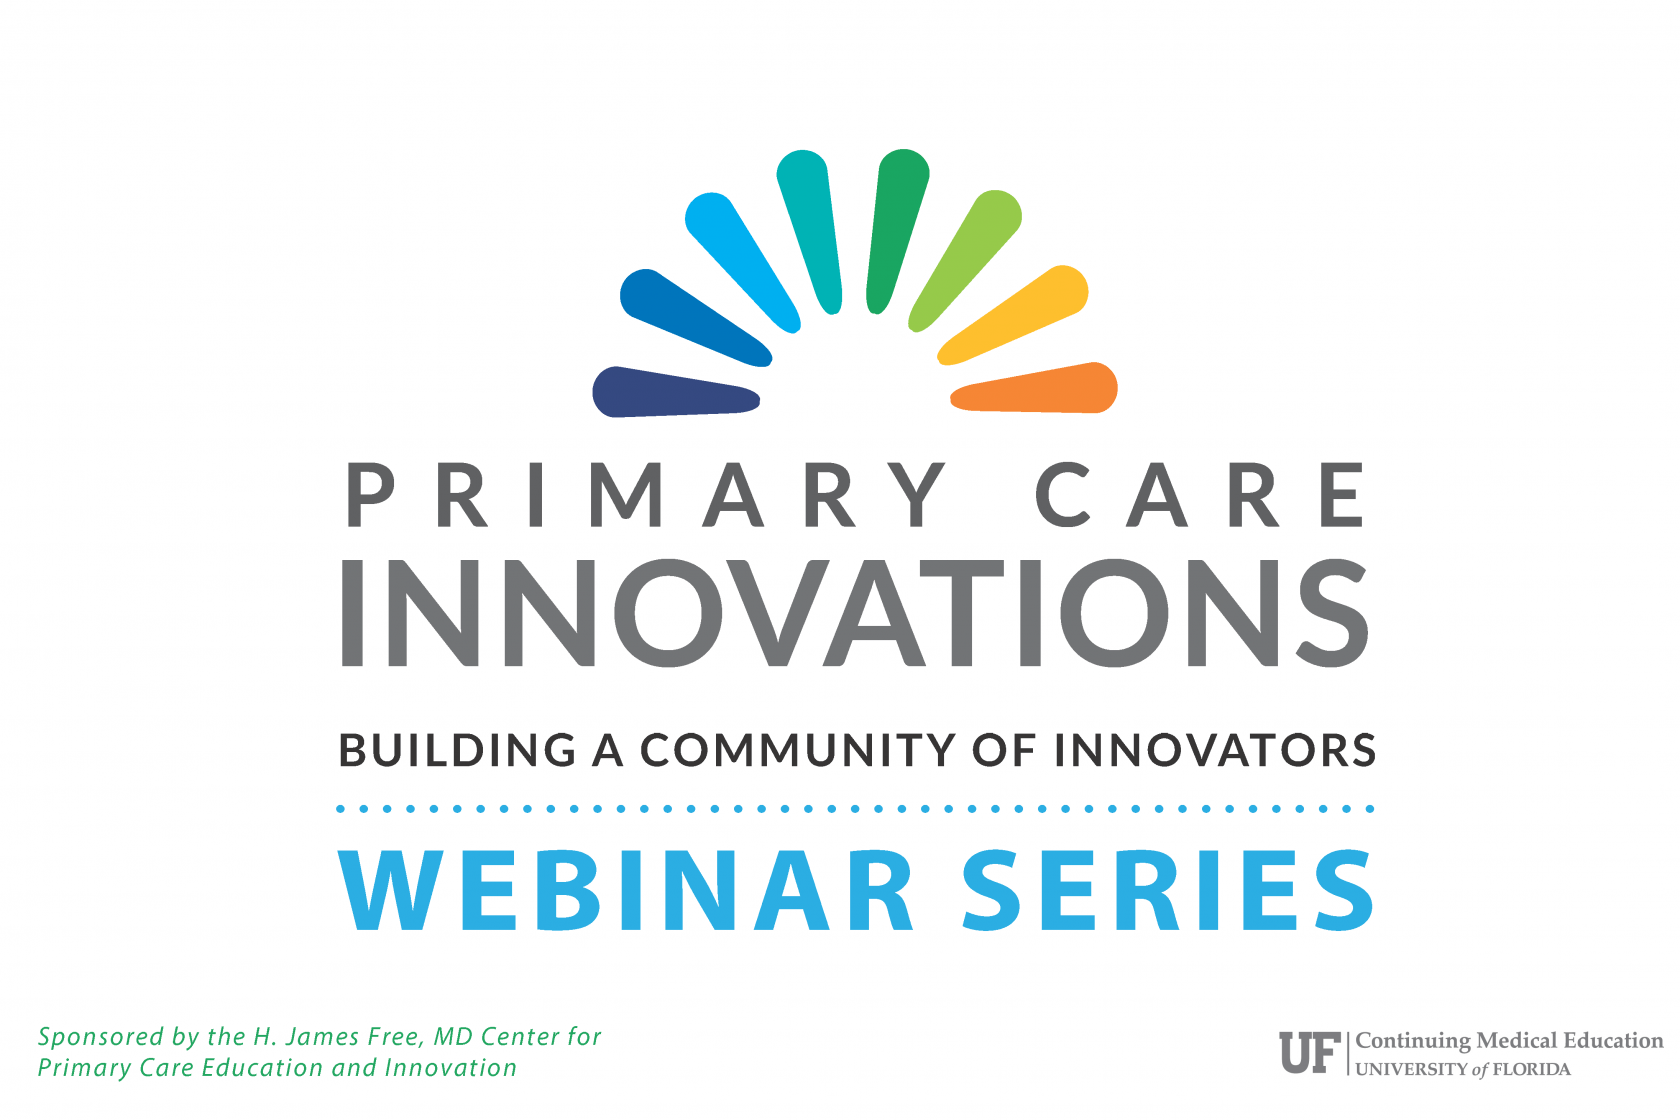 primary care innovations webinars